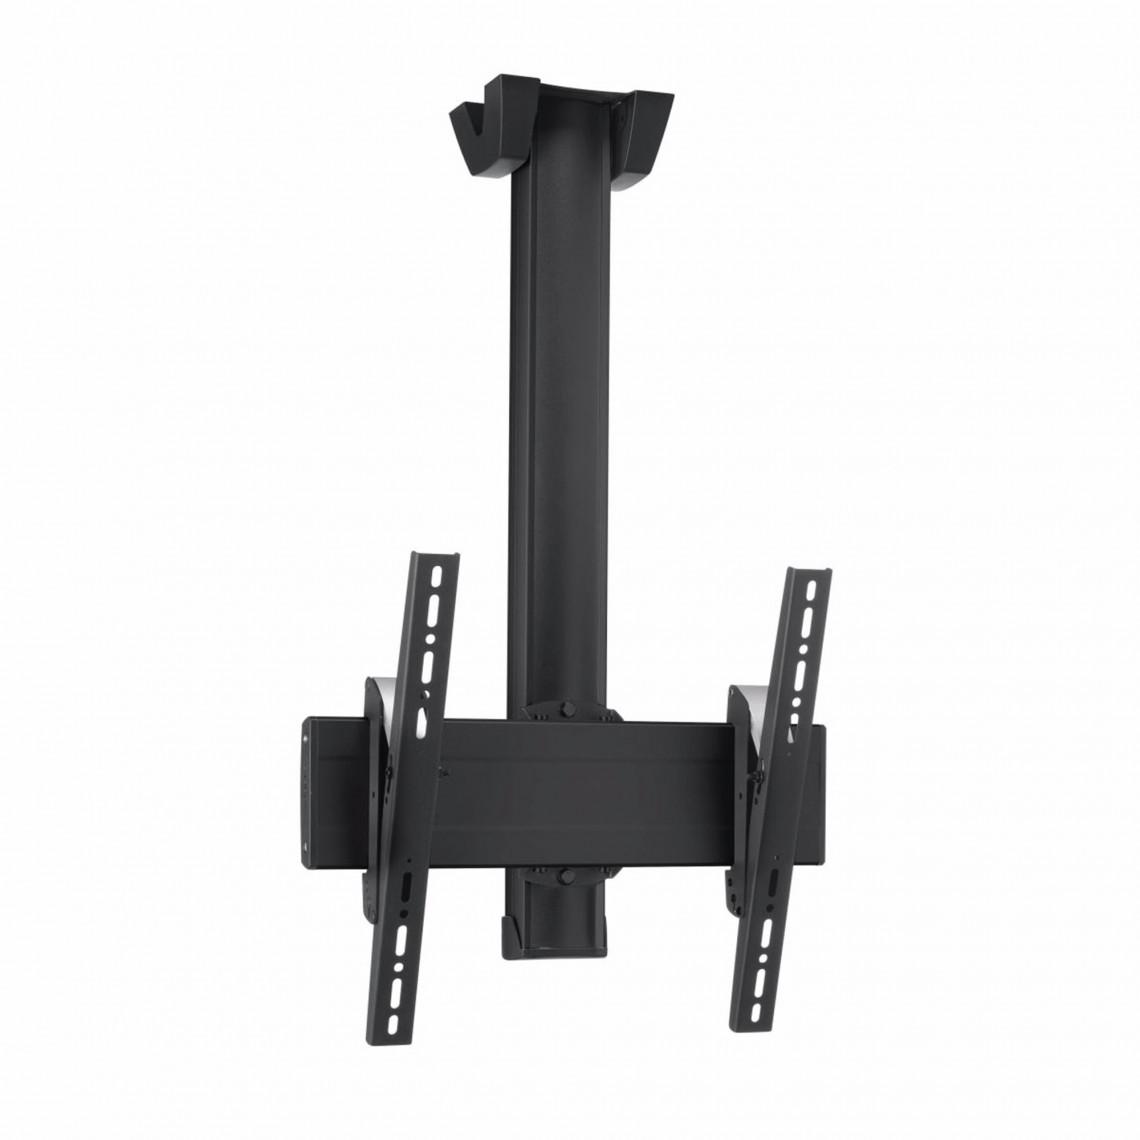 Vogel's Pro C 1544B Ceiling Mount, fixed 150cm 400x400 Black